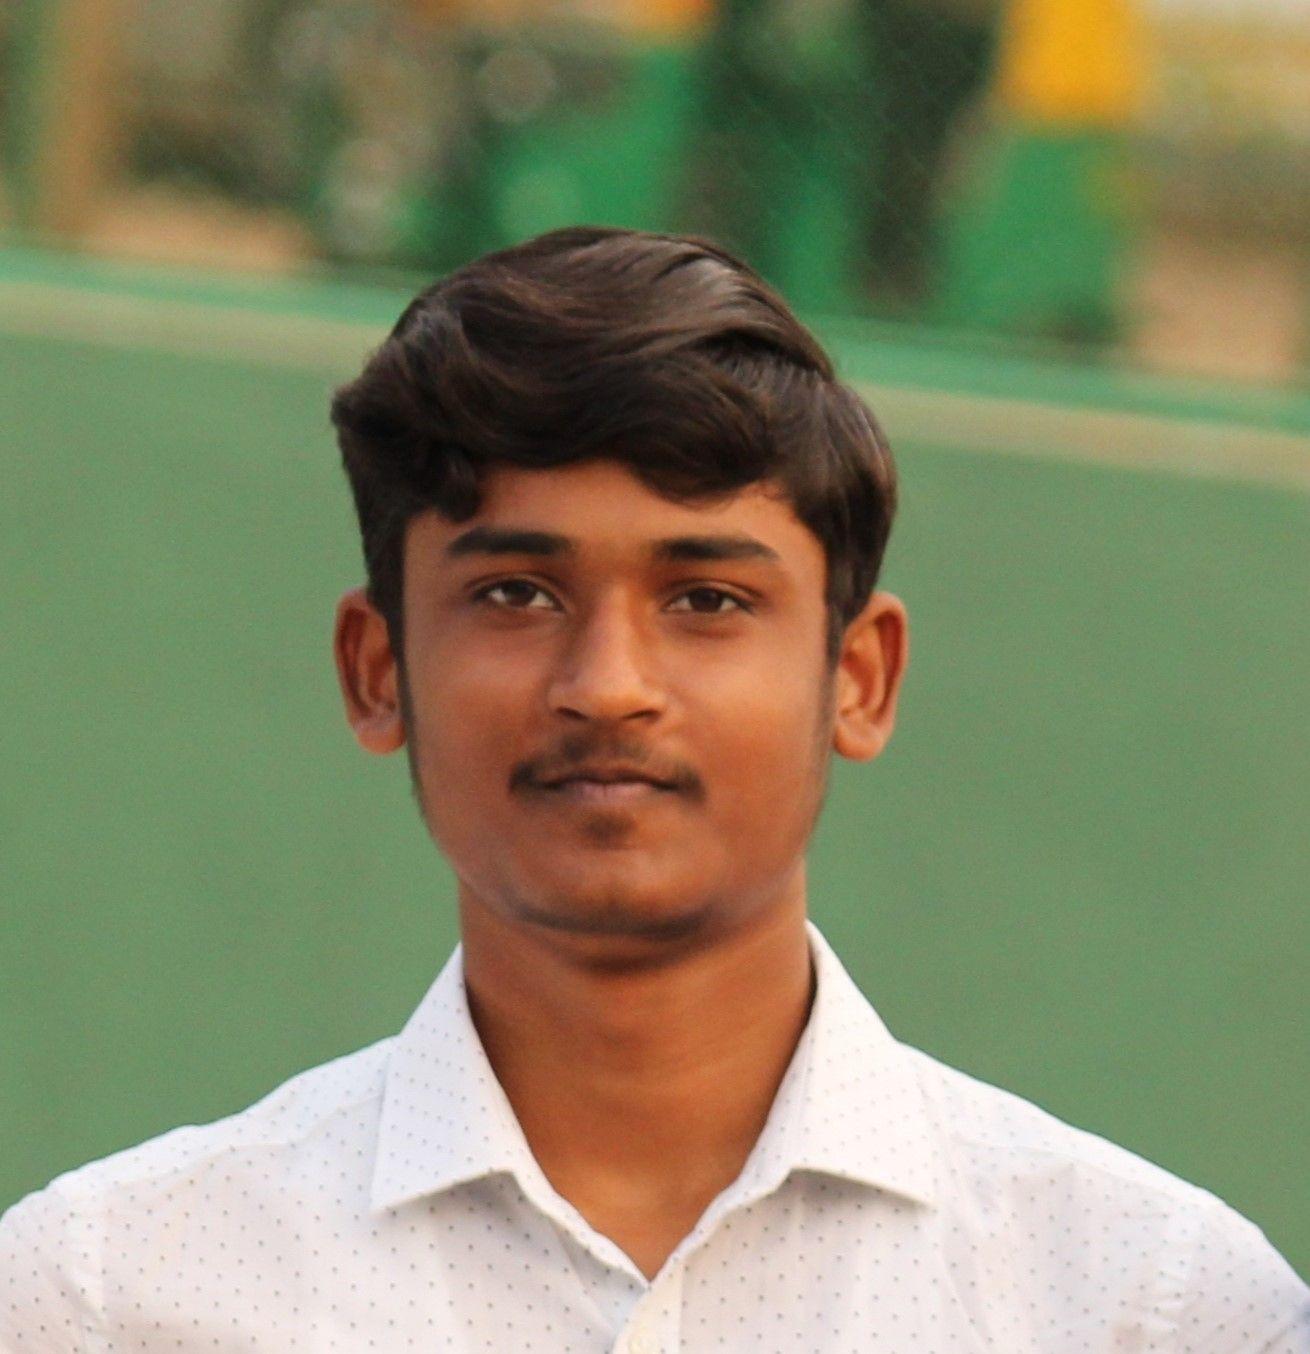 Aswin Barath Hacker Noon profile picture